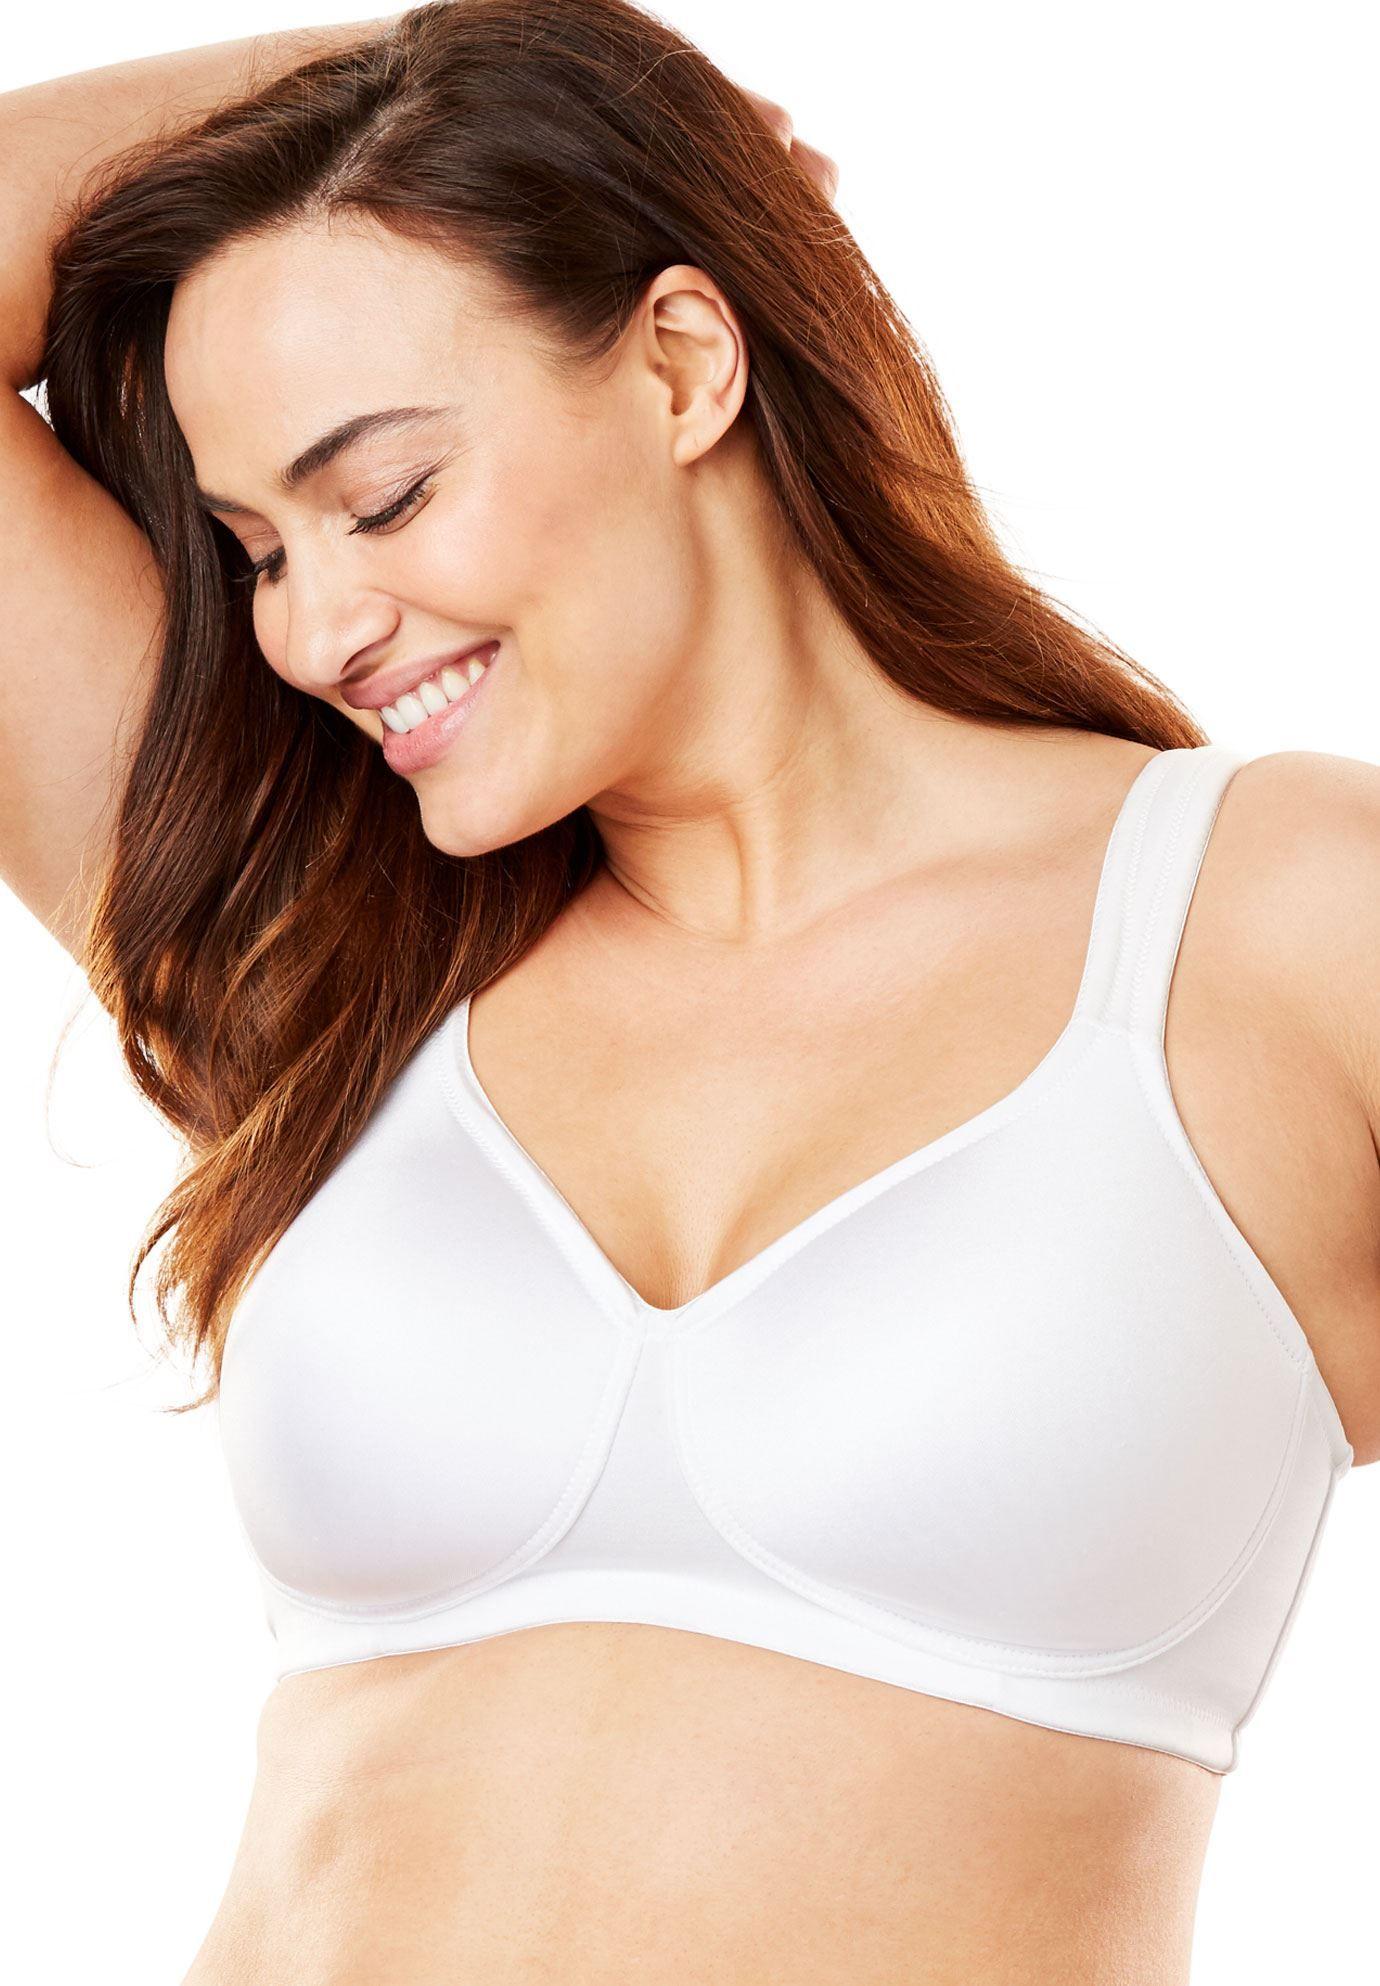 09304e2d15a Microfiber Wireless T-Shirt Bra by Comfort Choice - Women s Plus Size  Clothing